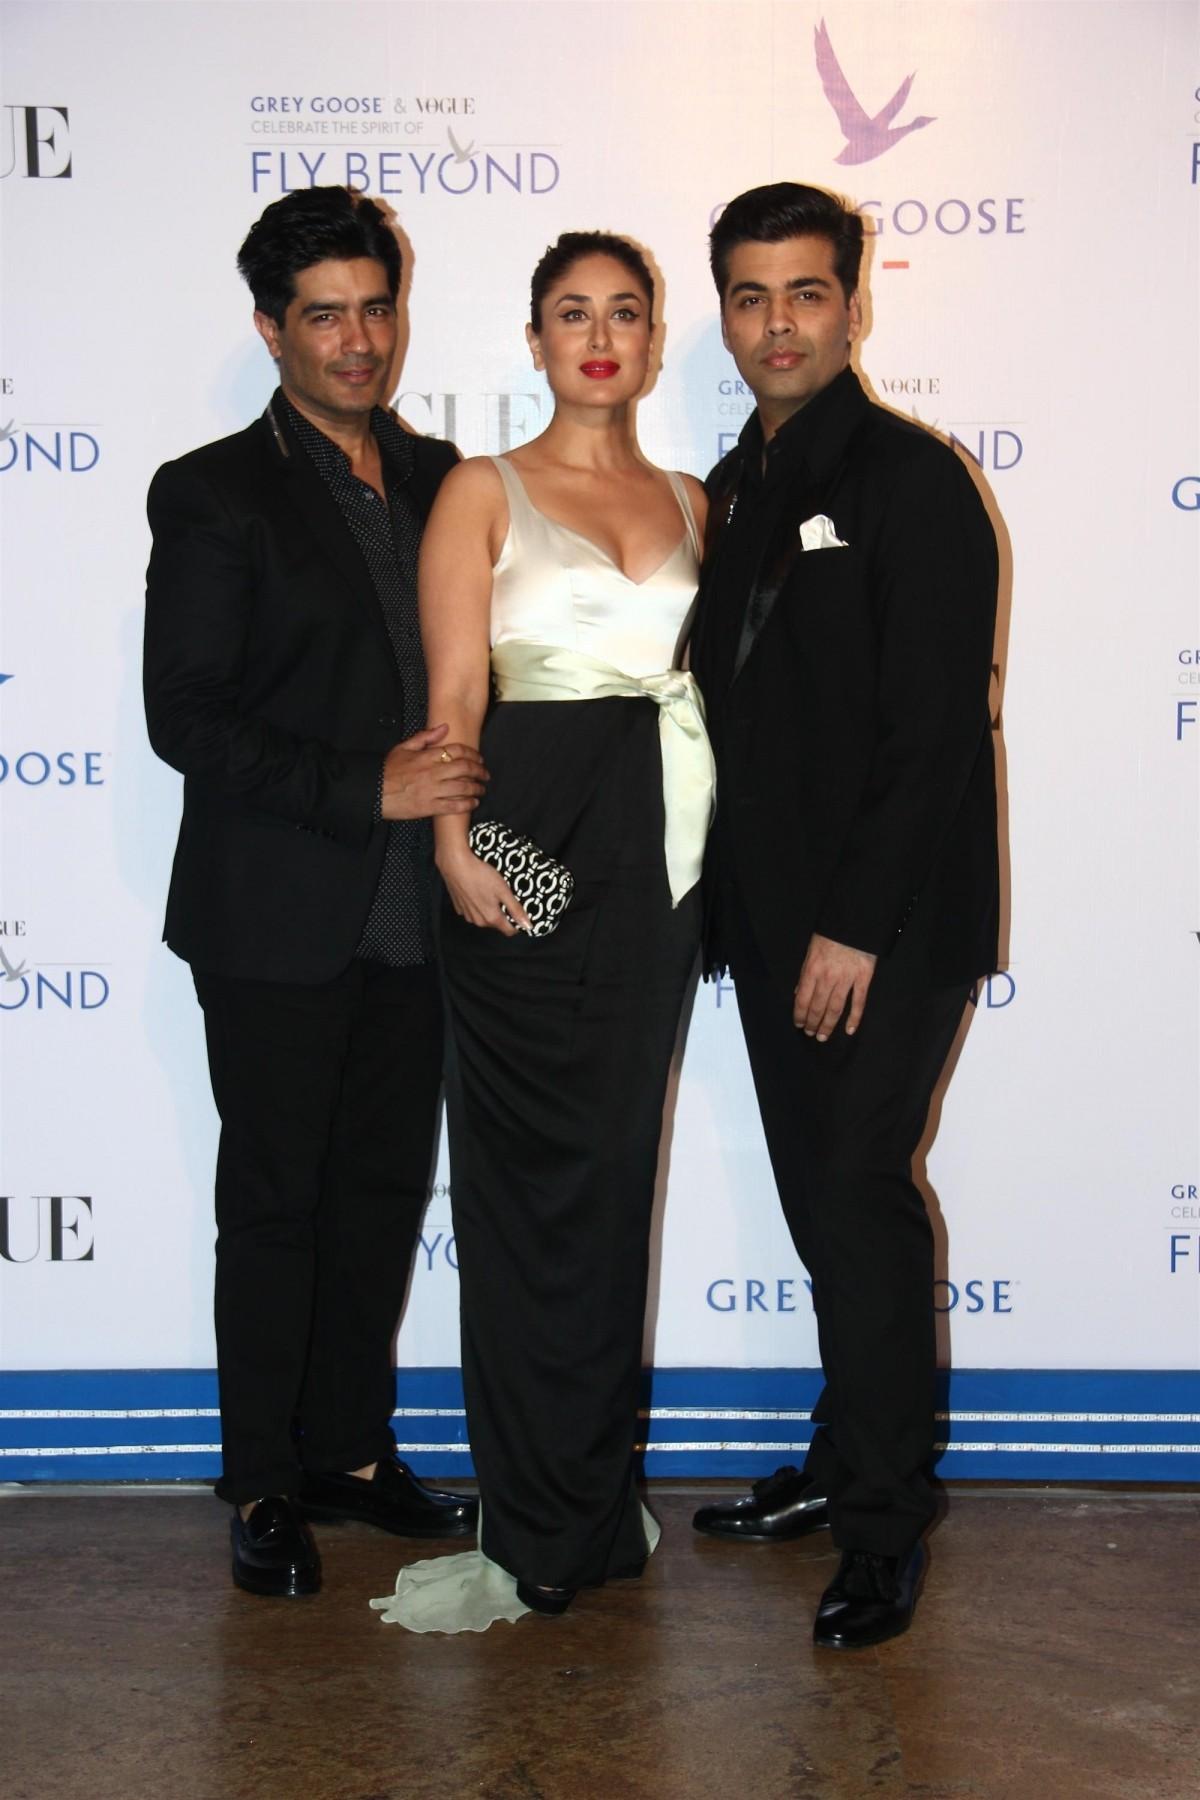 Hrithik Roshan, Kareena Kapoor Khan, Farhan Akhtar and Other Celebs look Stunning at Grey Goose India's Fly Beyond Awards 2014